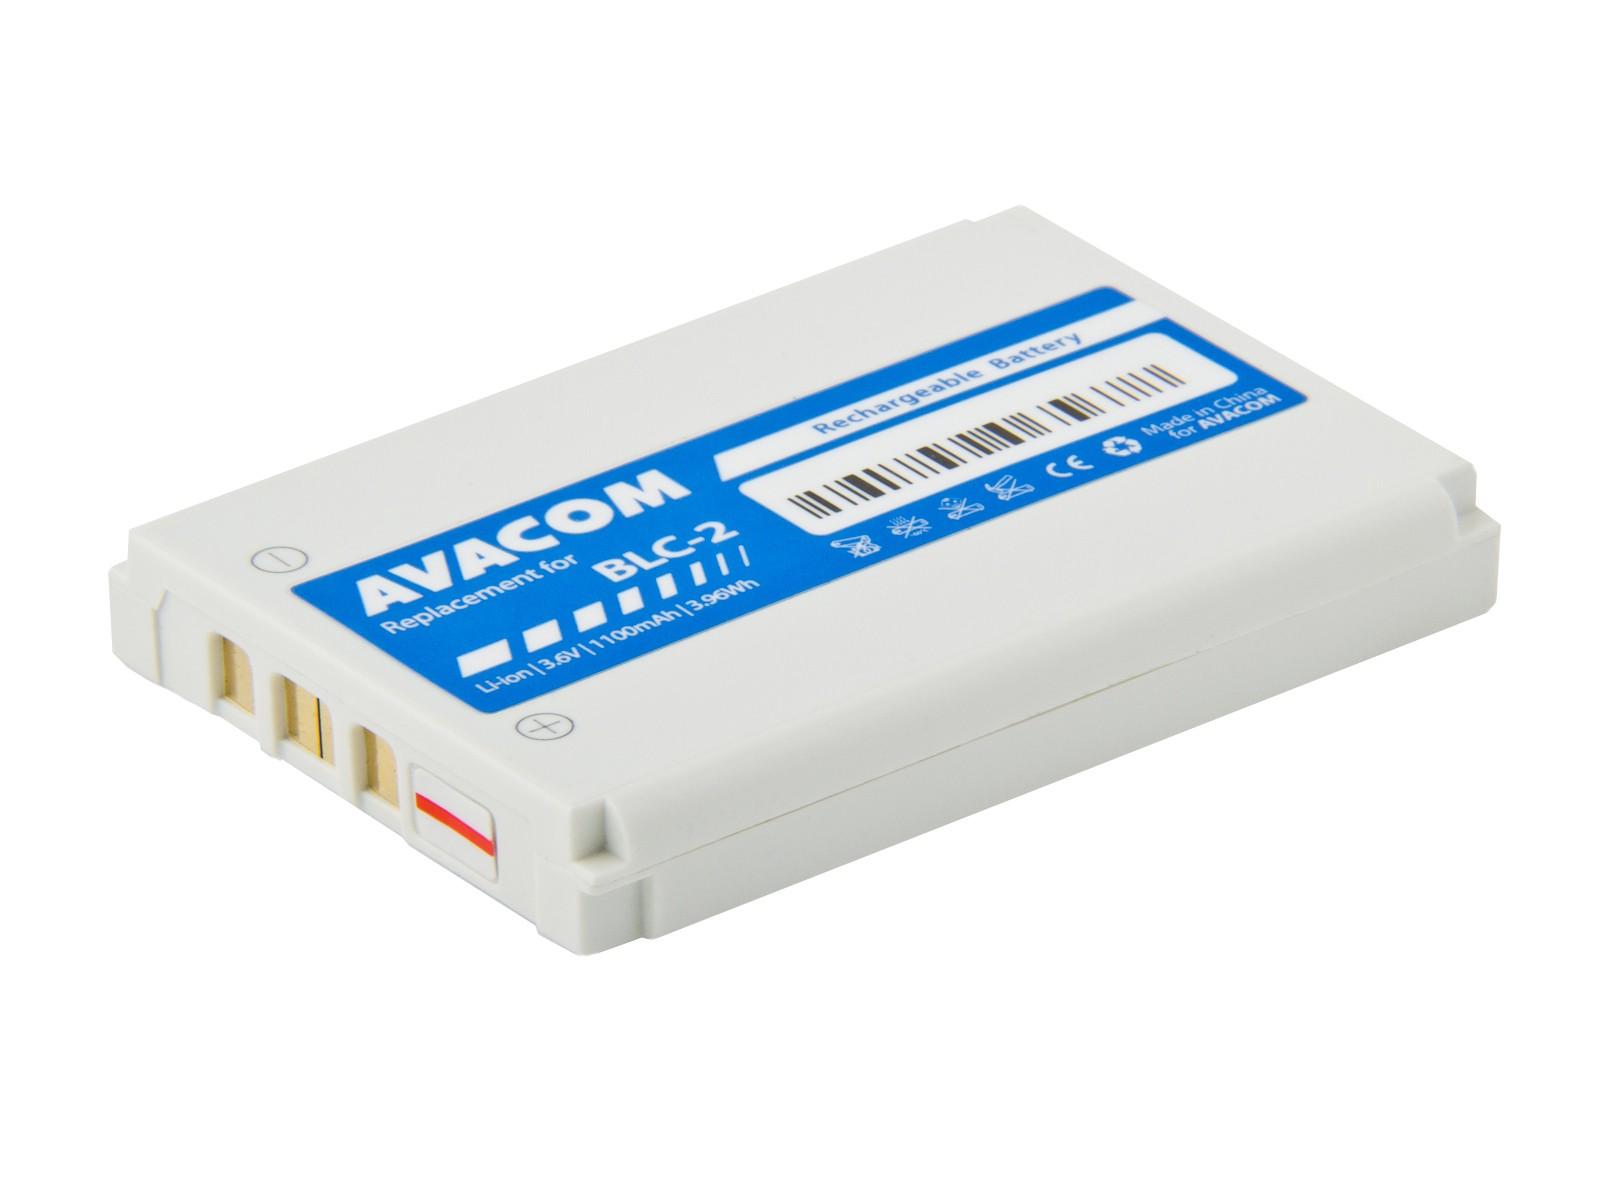 Náhradní baterie AVACOM do mobilu Nokia 3310, 3410, 3510, Li-ion 3,7V 1100mAh (náhrada BLC-2)